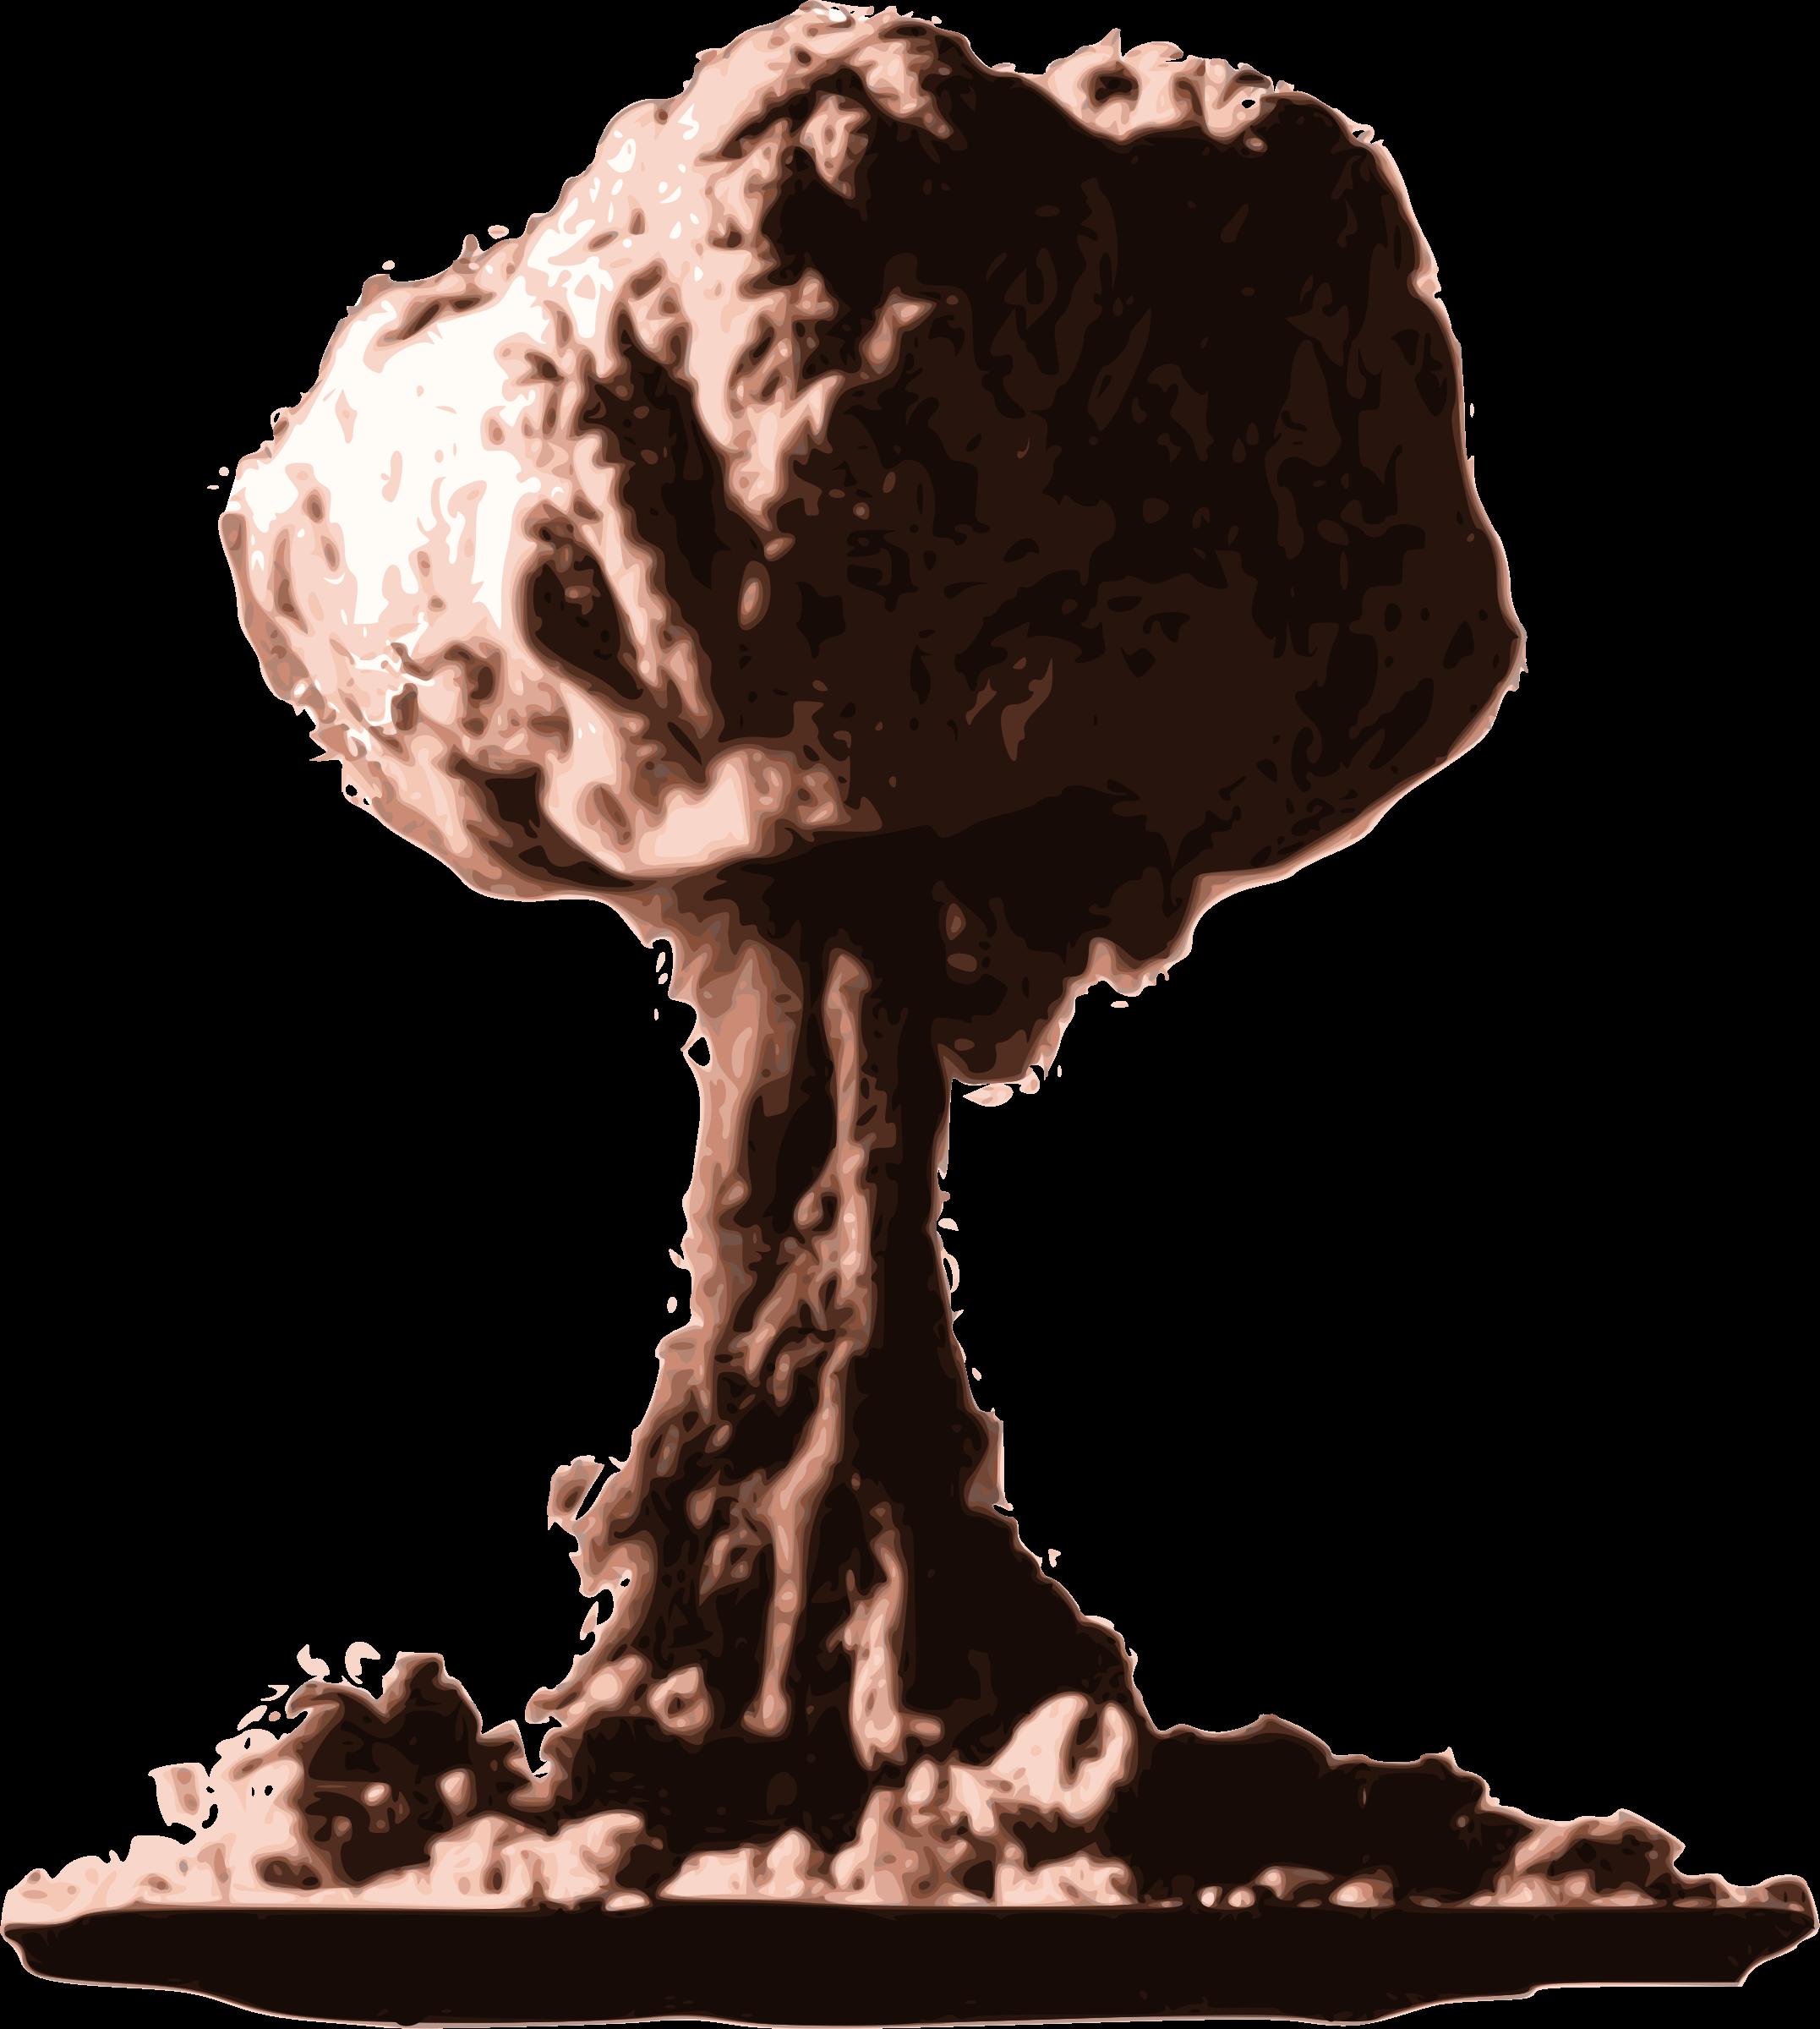 Atomic Mushroom Cloud Clipart - Clipart Kid